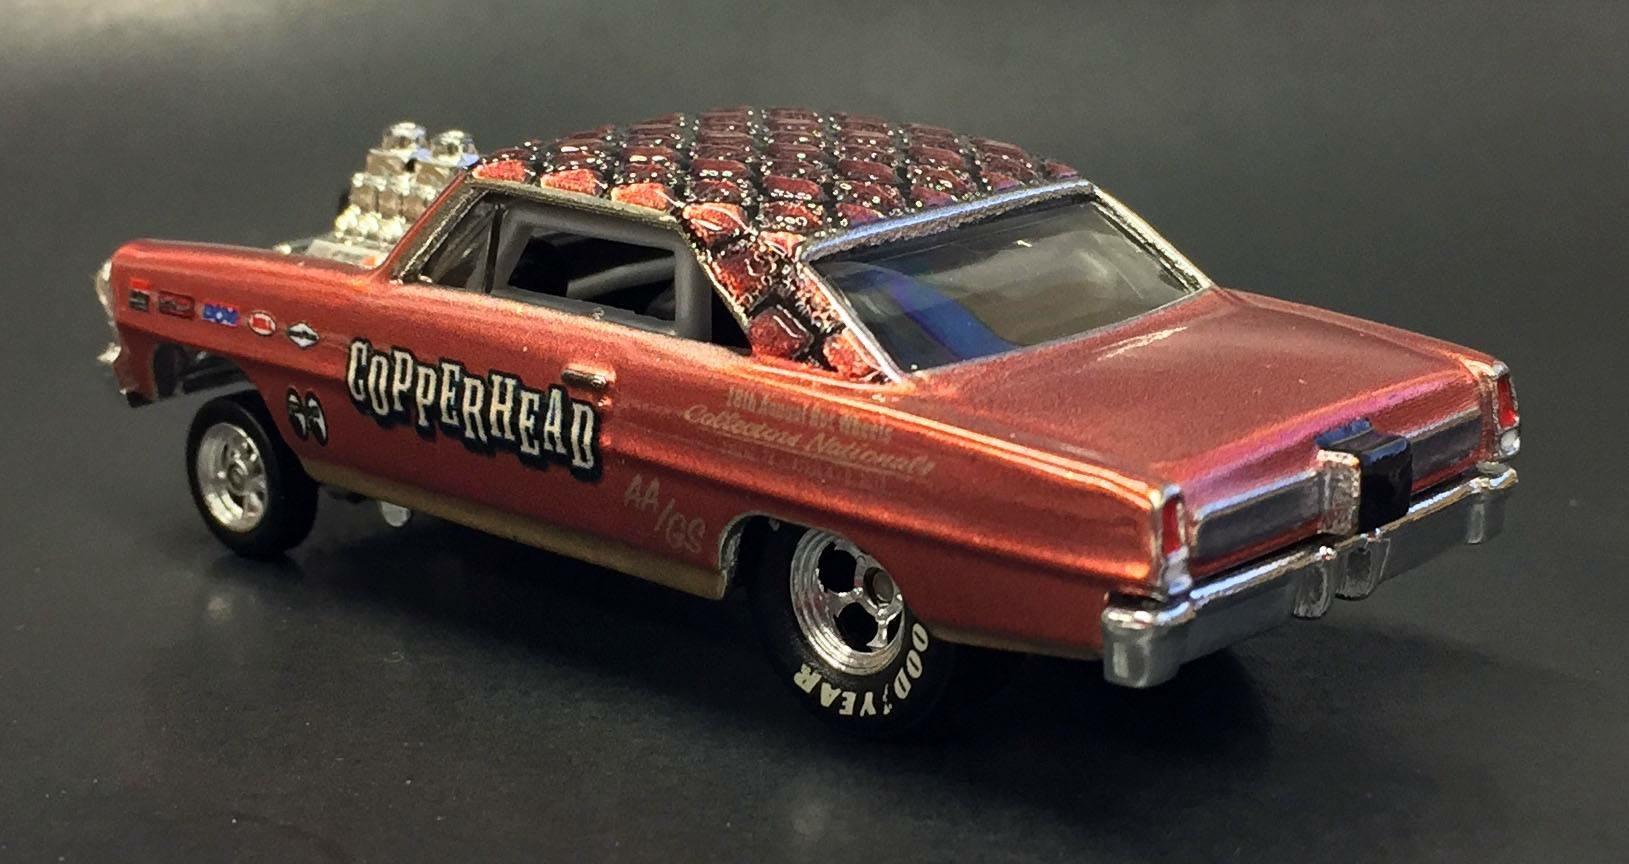 You gotta check out the Hot Wheels '66 Super Nova Gasser Nationals